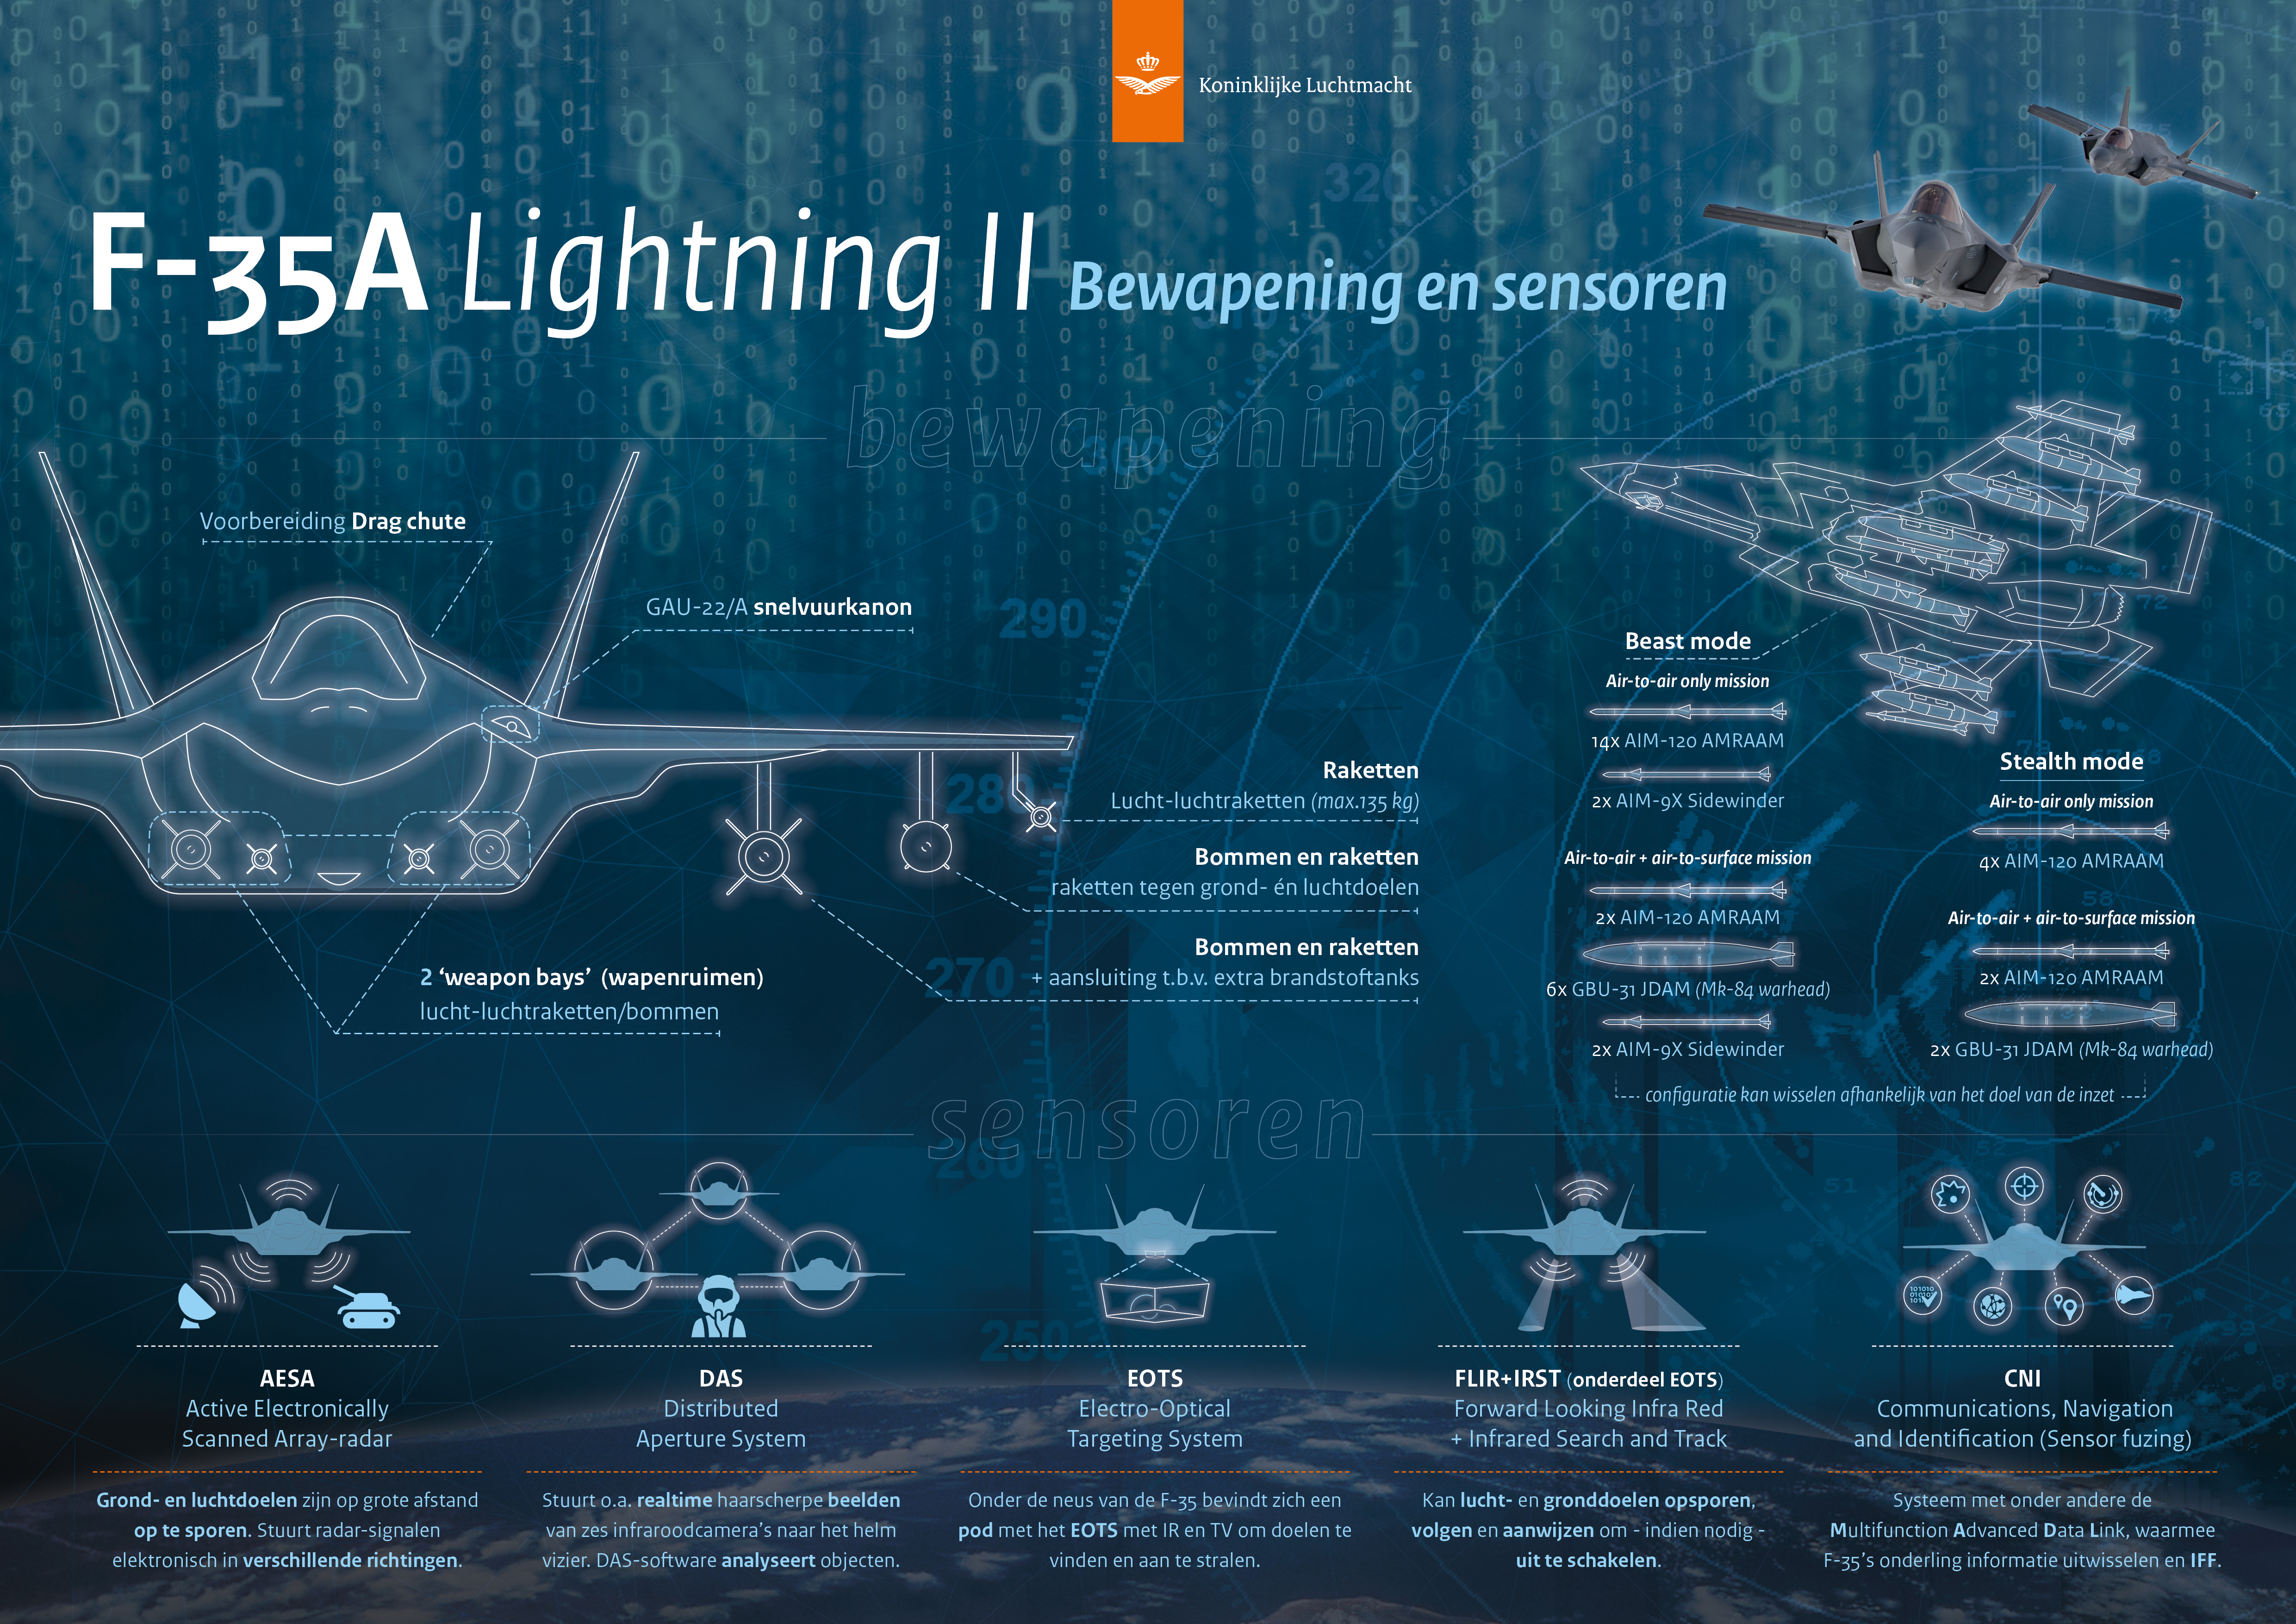 KLu infographic F-35 Lightning II, bewapening en sensoren